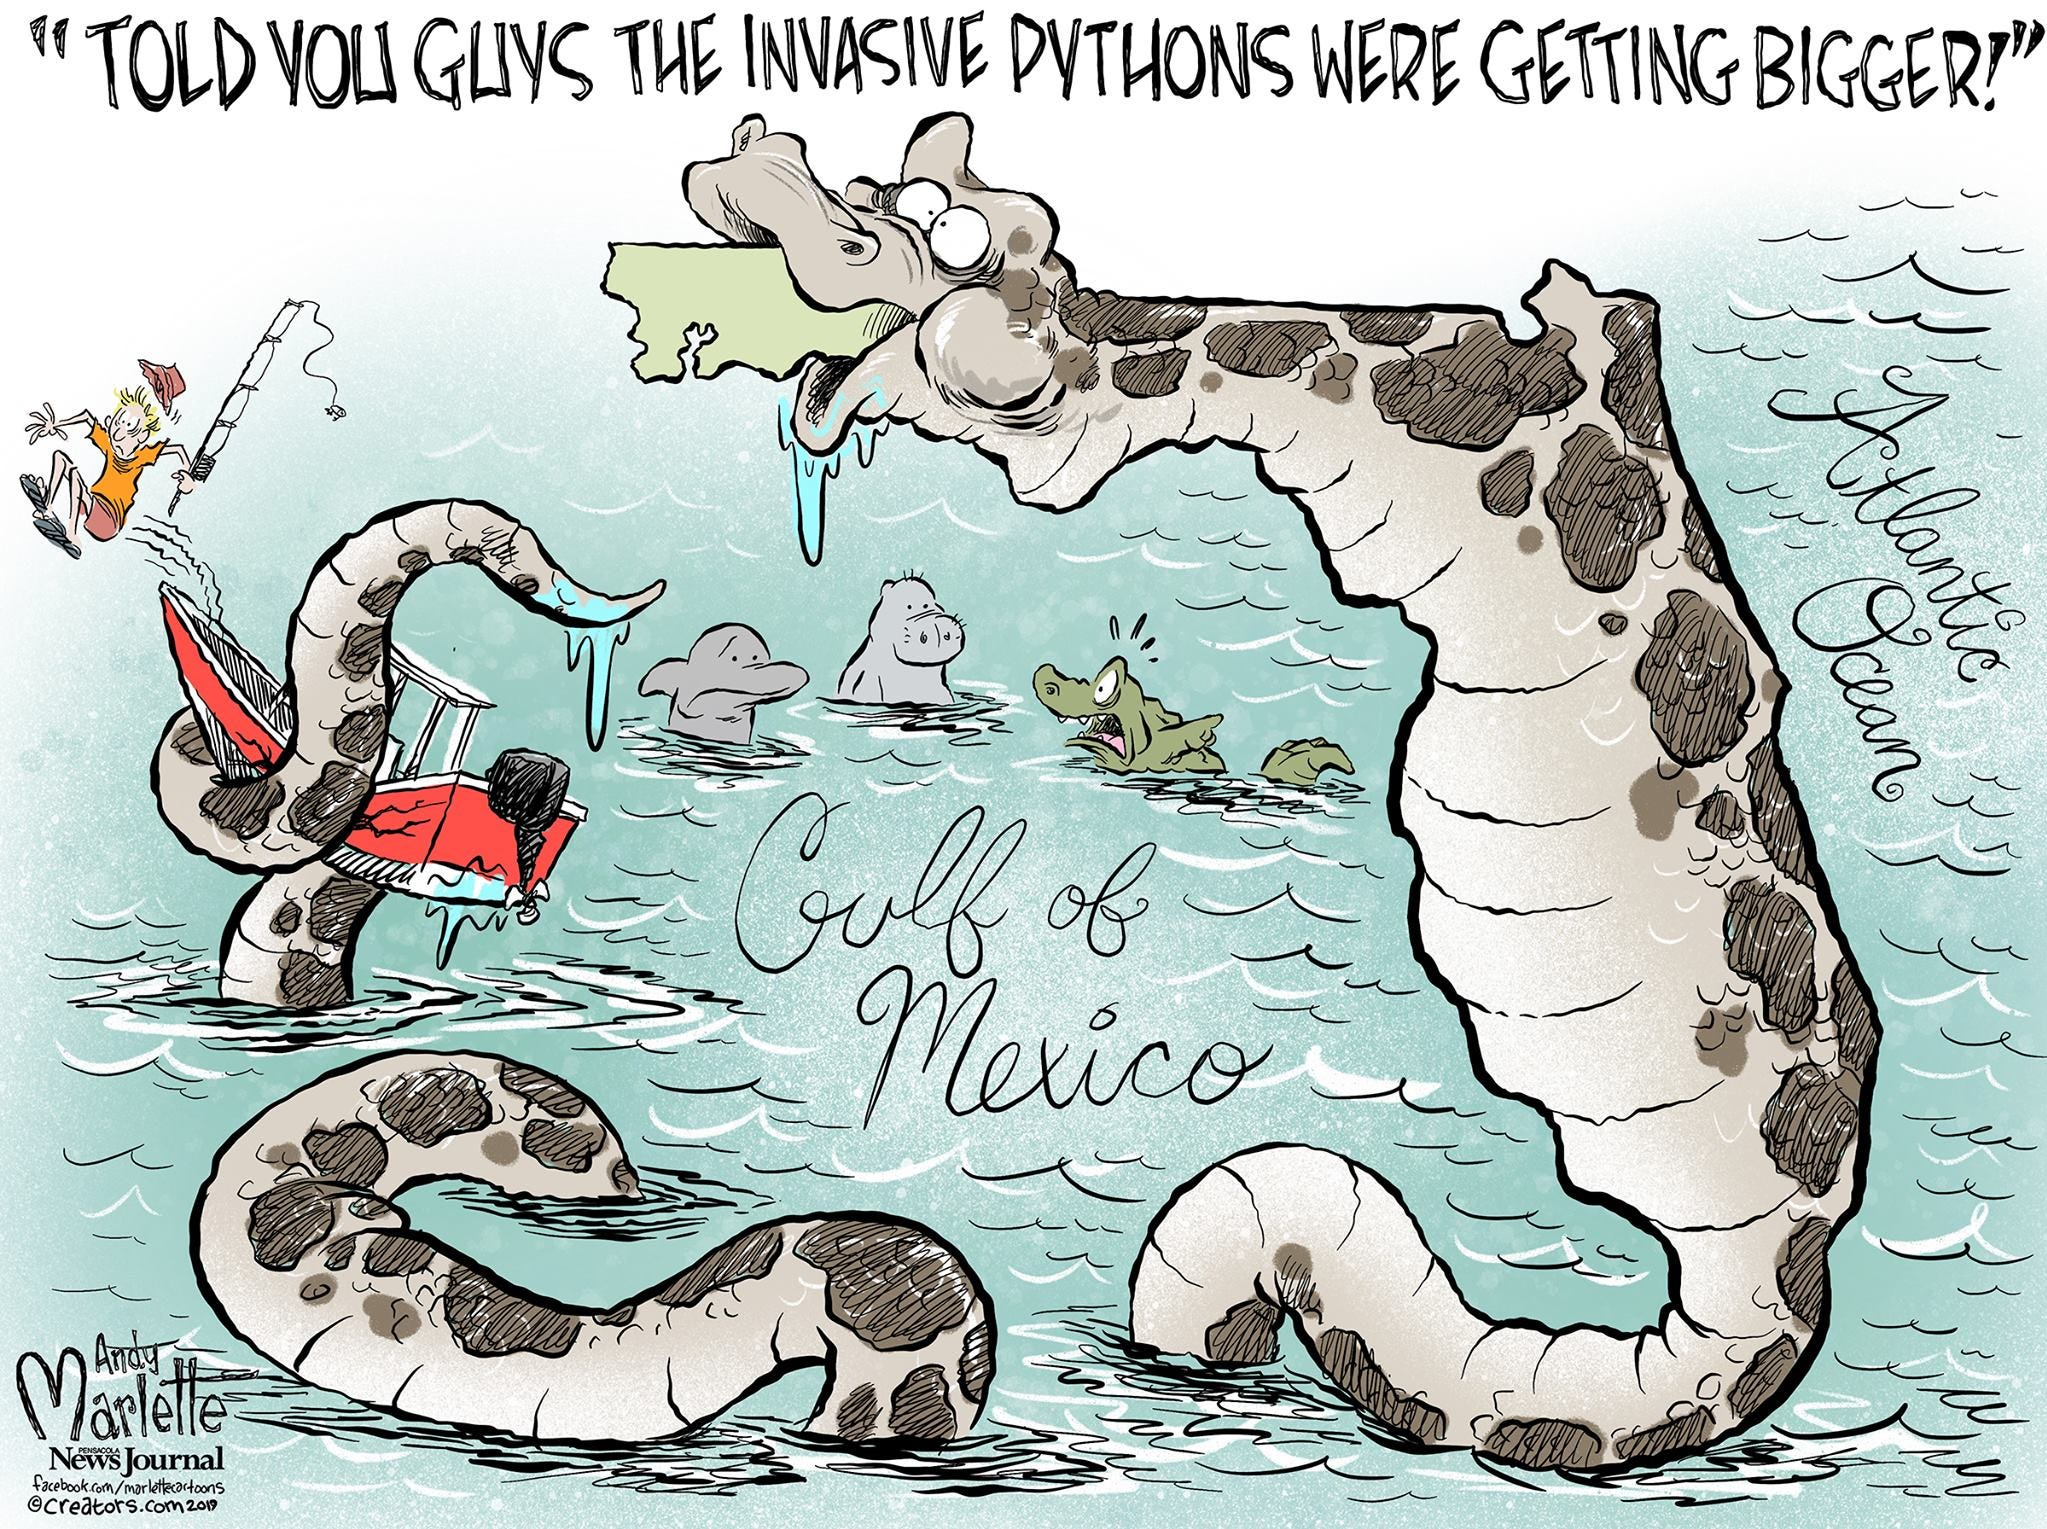 Florida pythons